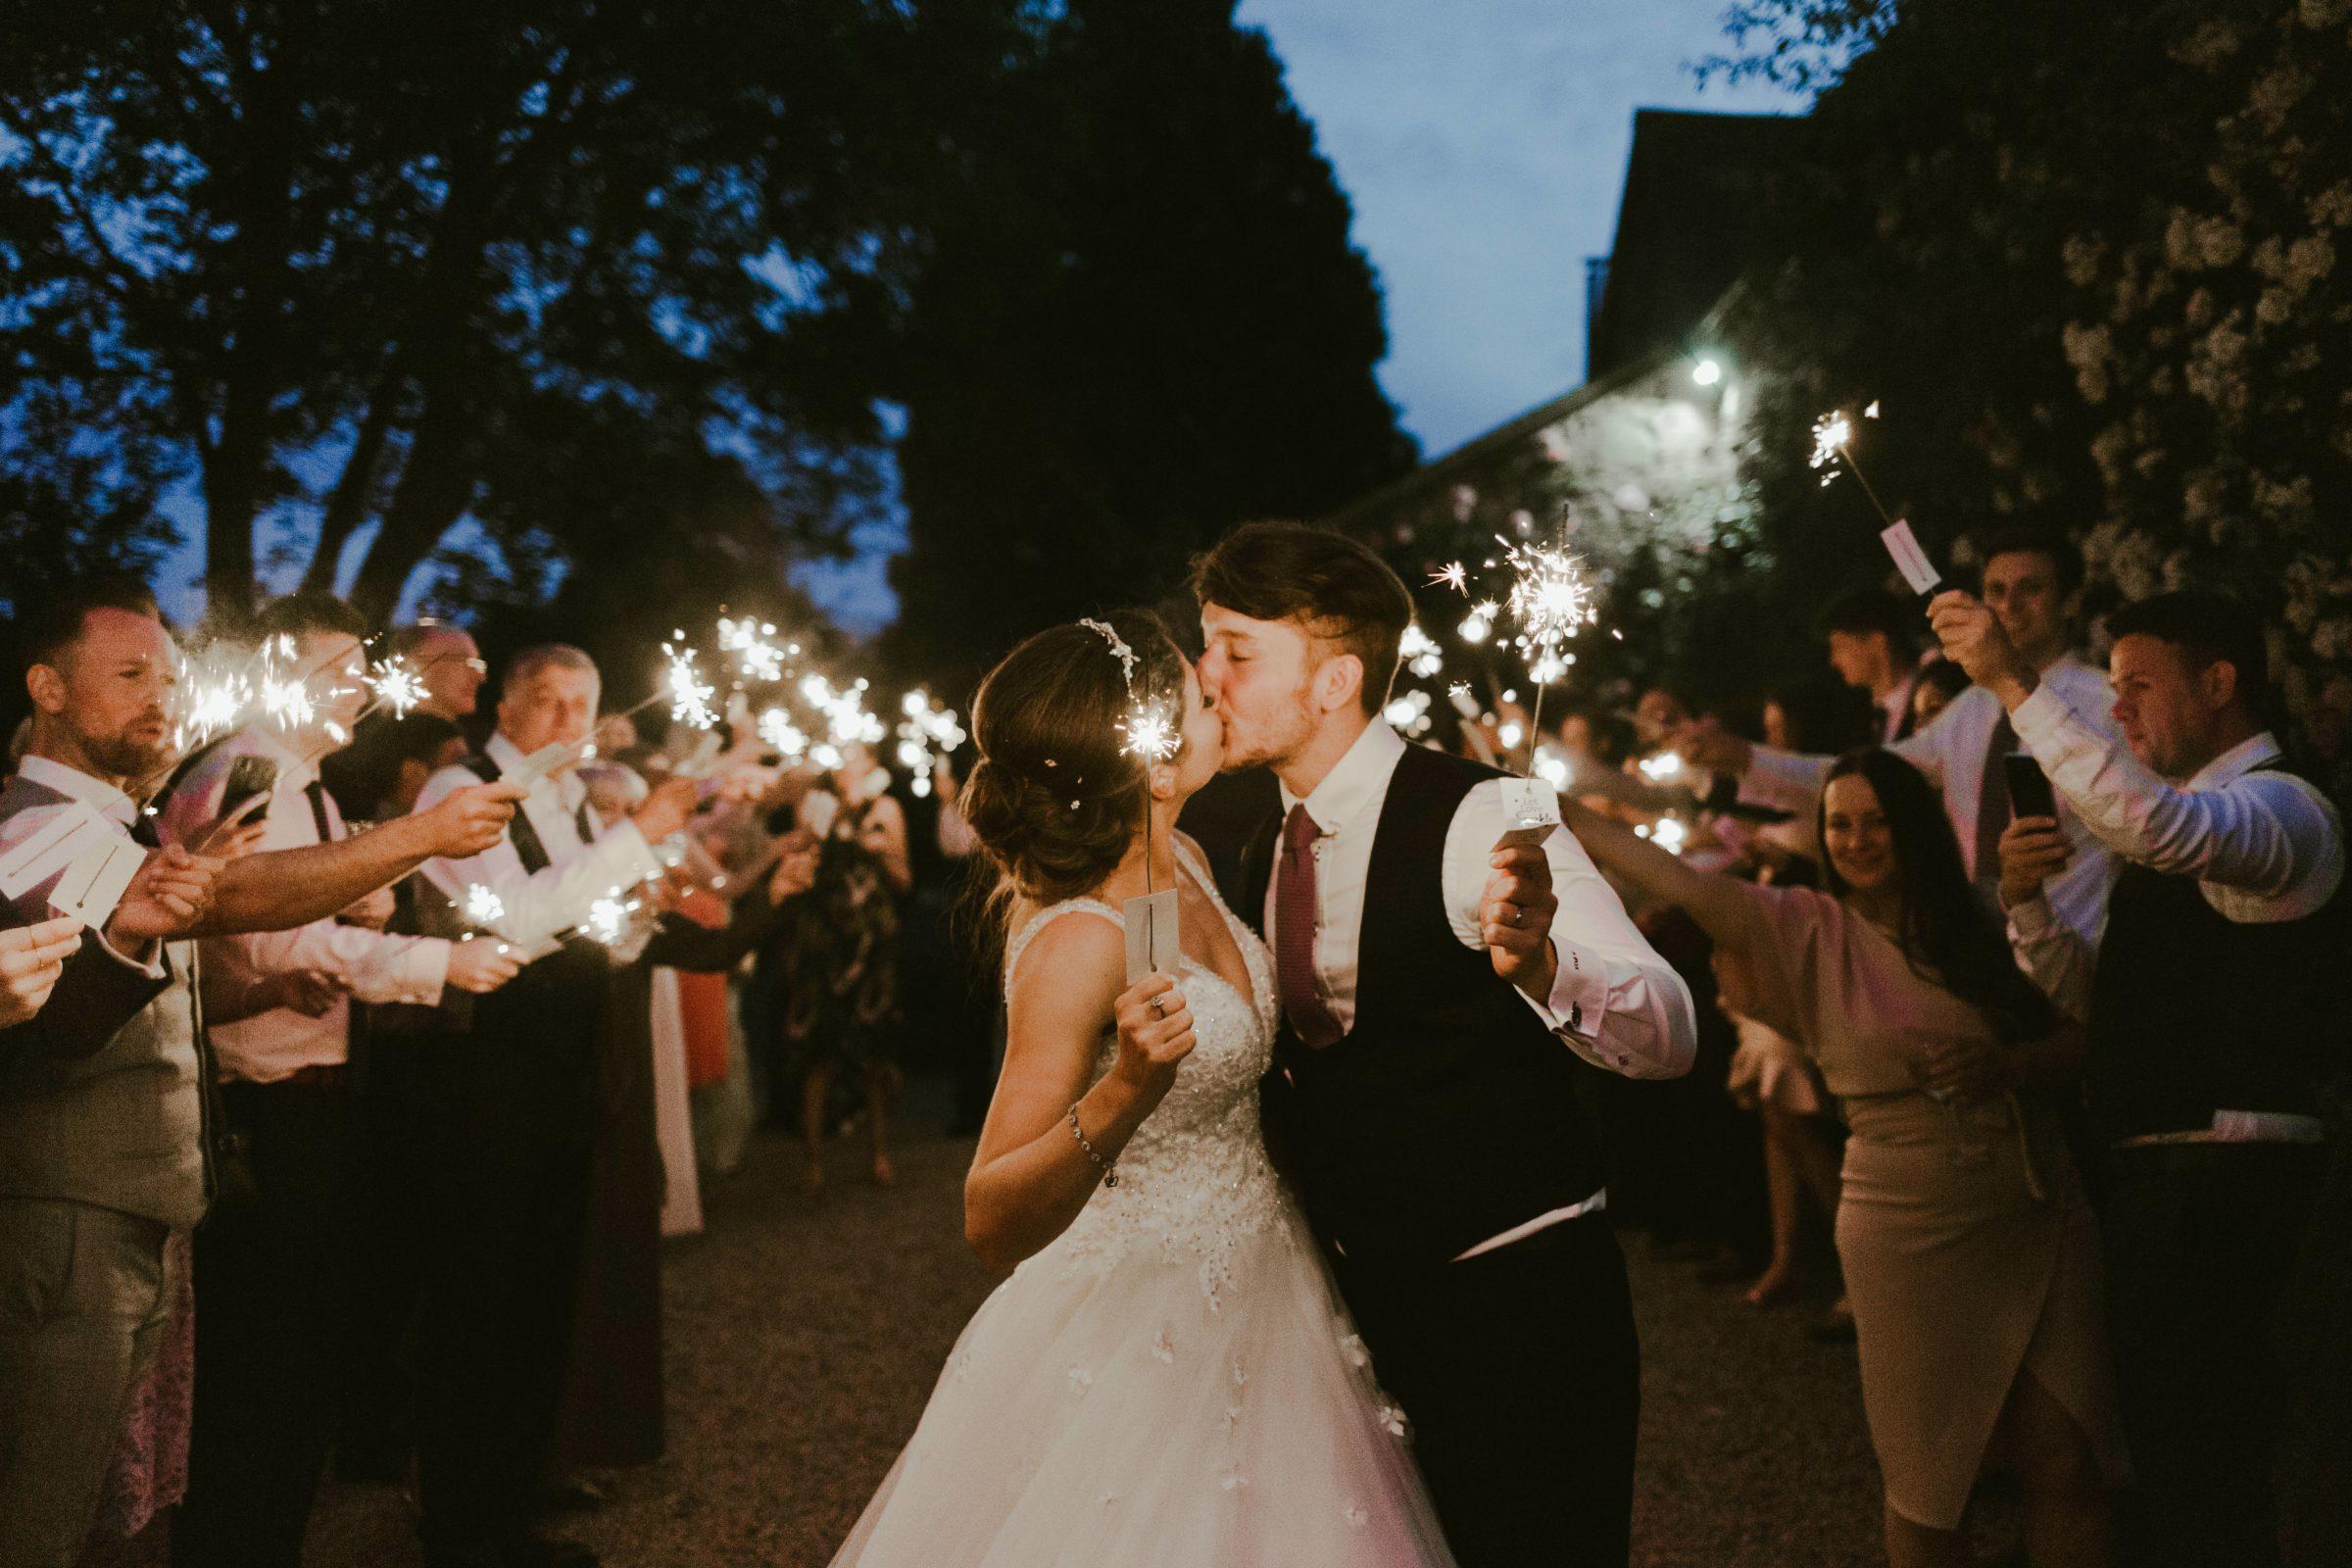 birtsmorton-court-wedding-venue-malvern-uk-sparklers-photography-photographer-couple